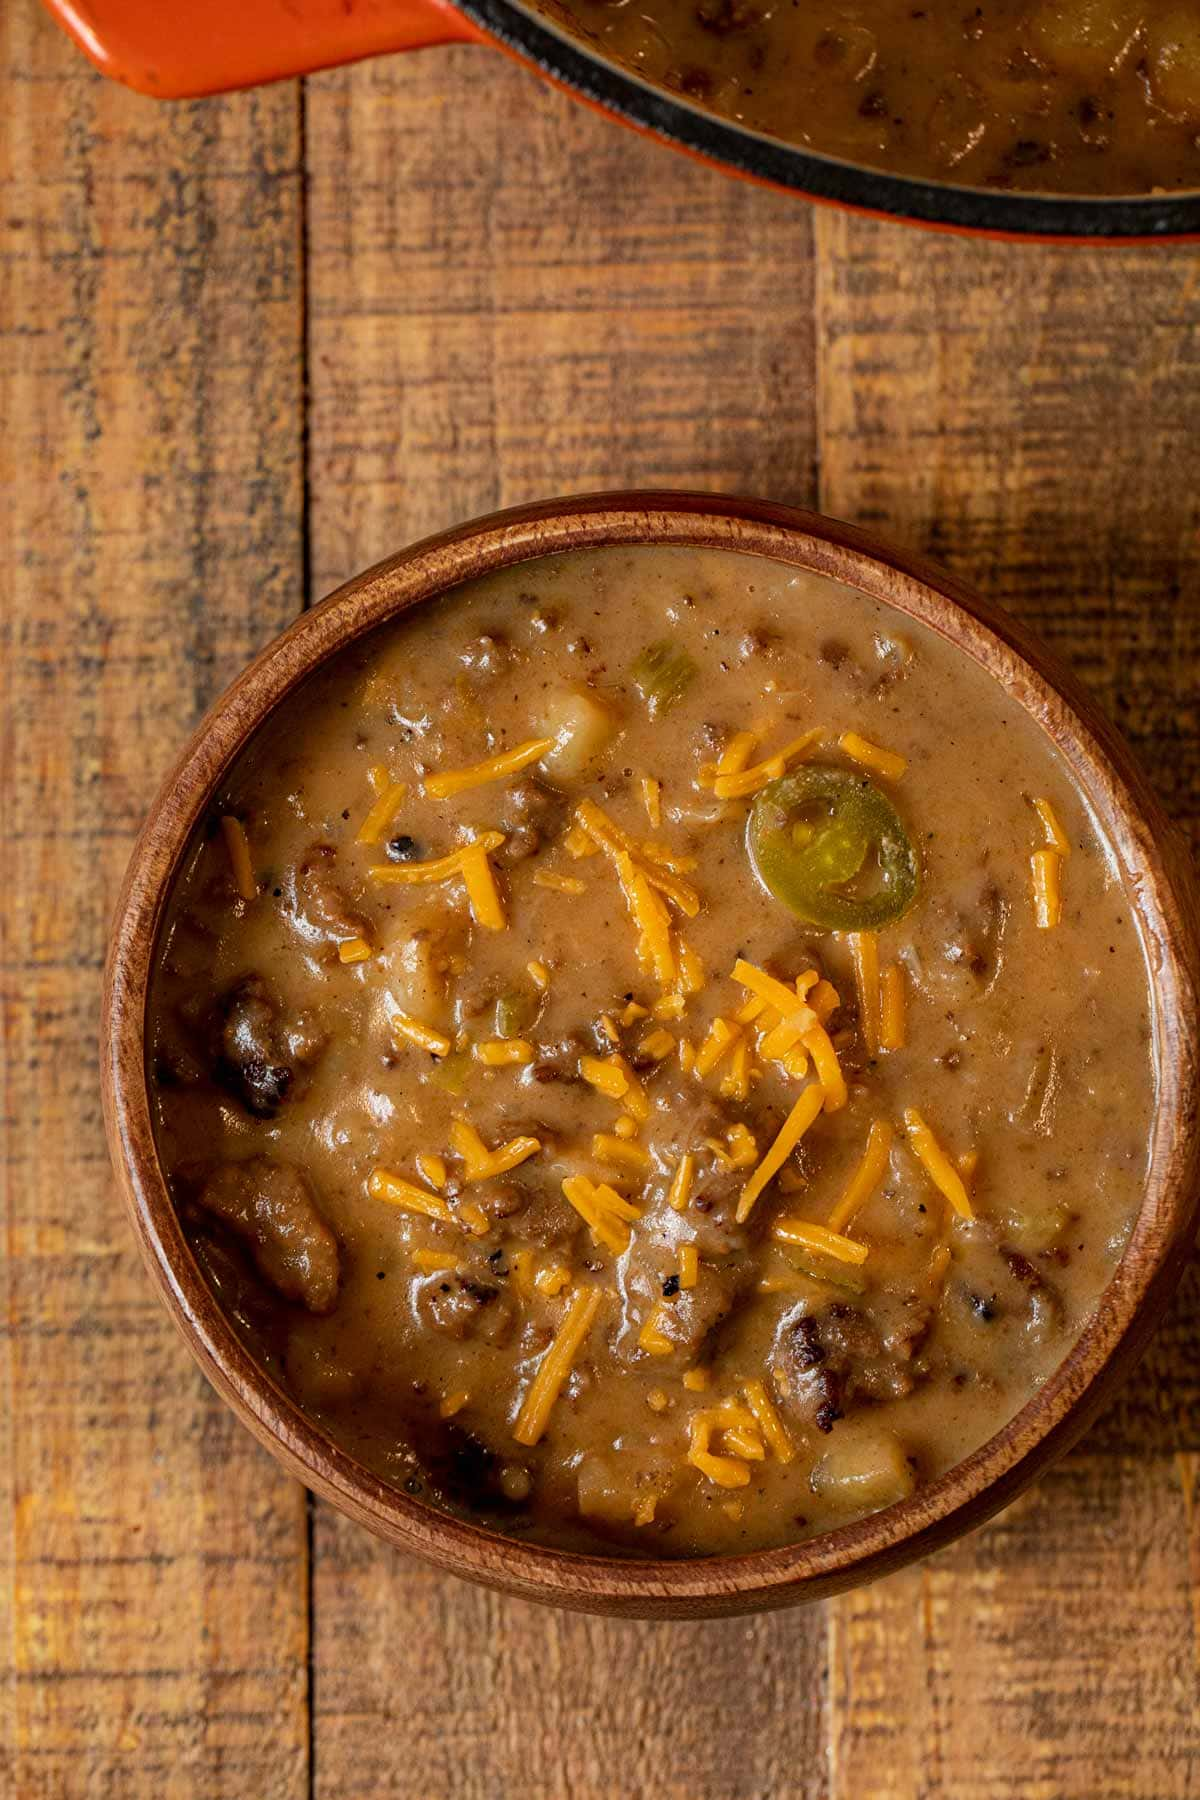 Cheesy Bratwurst Soup in bowl